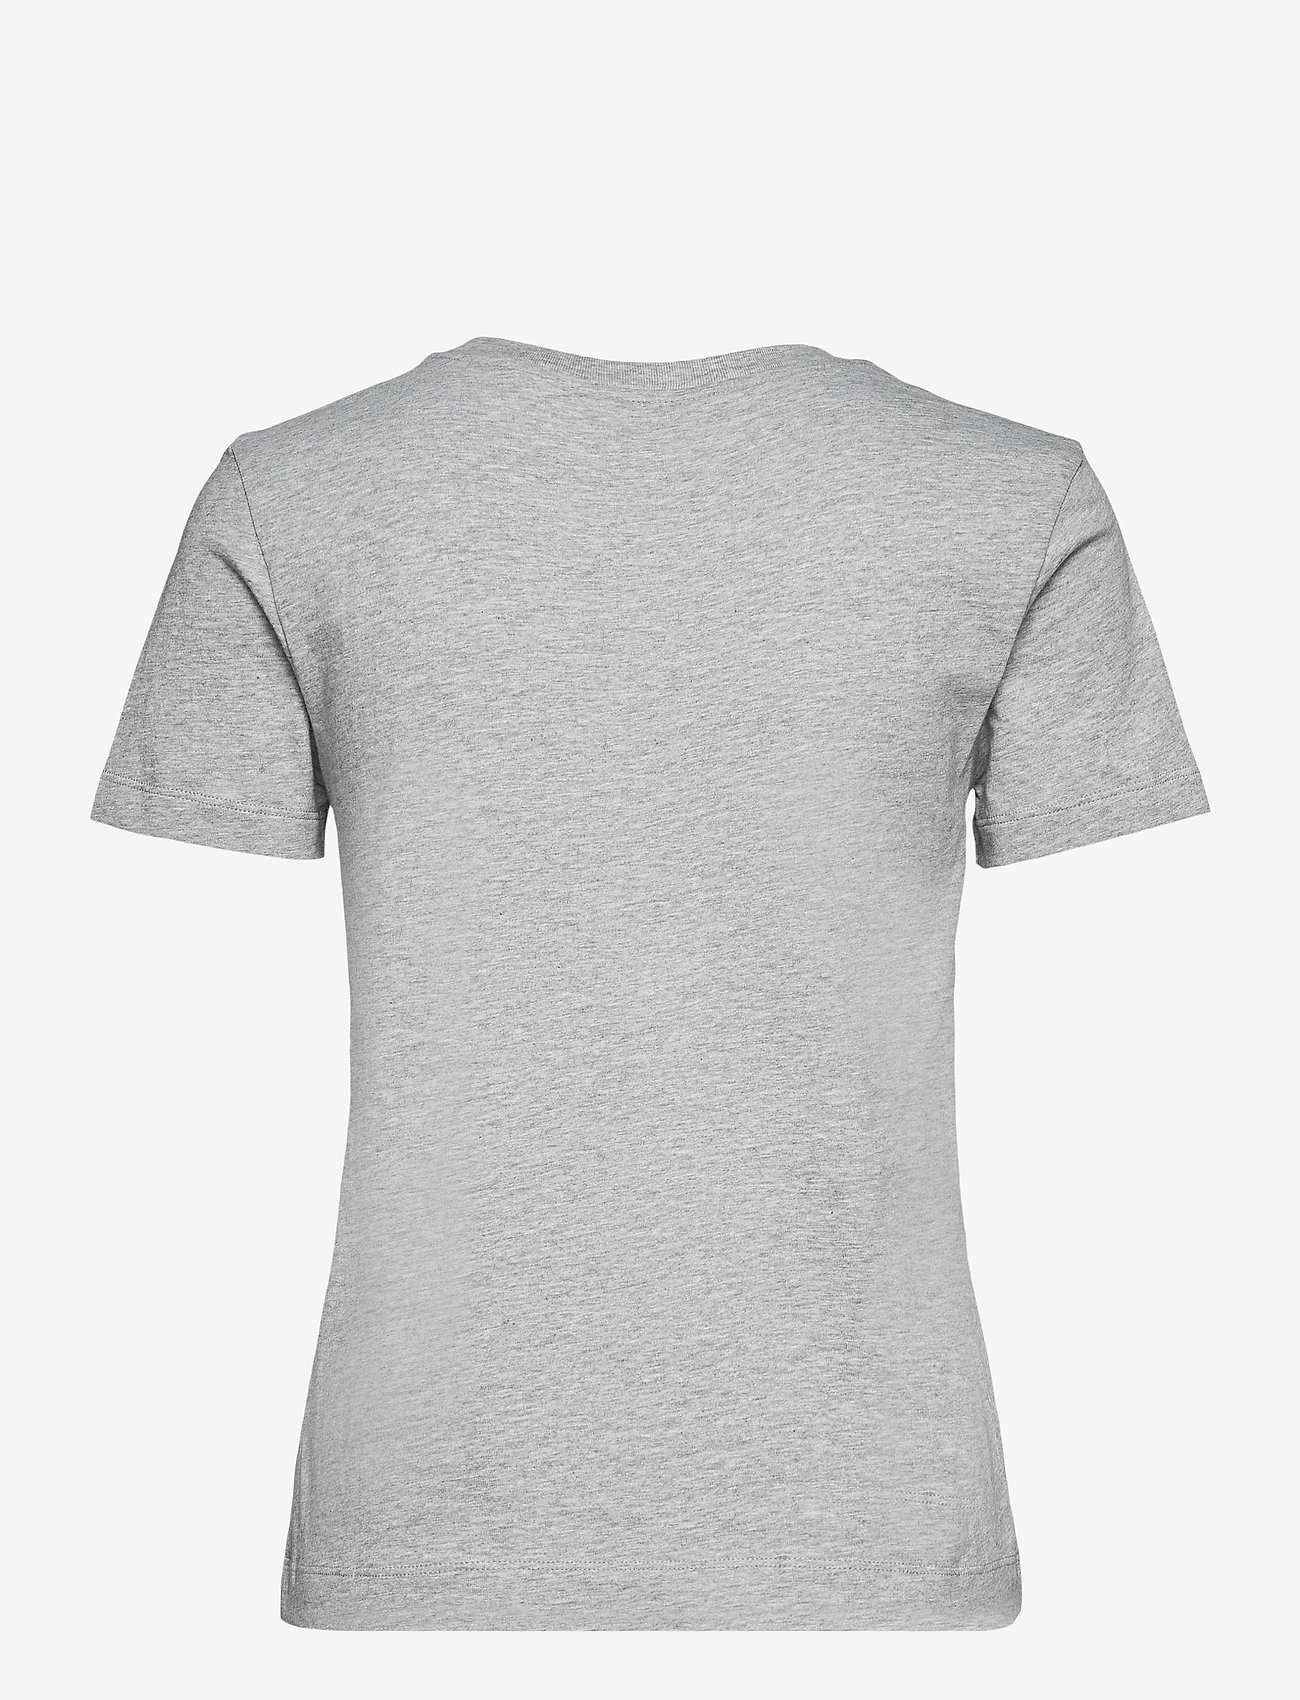 GANT - ARCHIVE SHIELD SS T-SHIRT - t-shirts - grey melange - 1